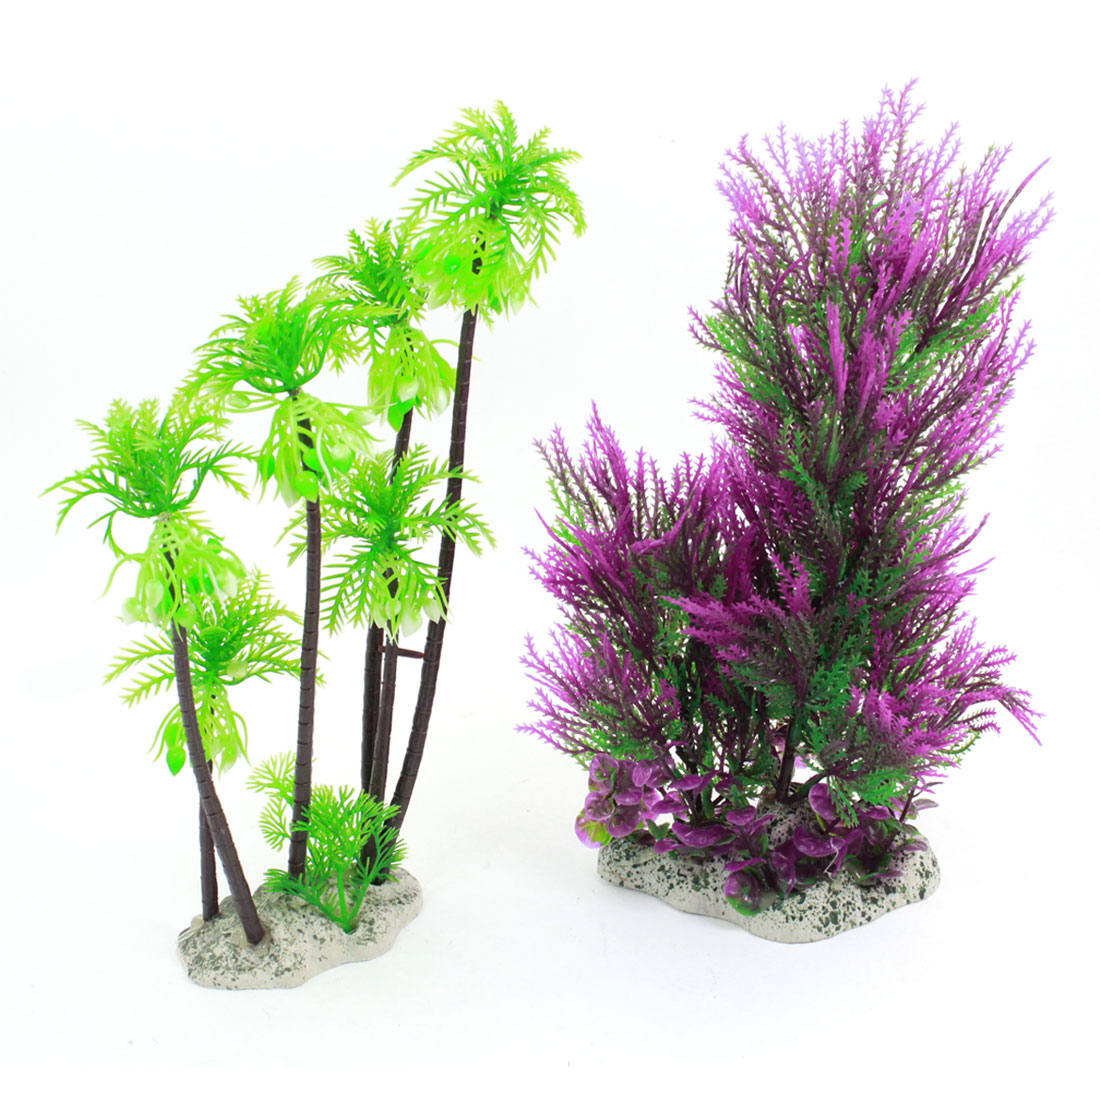 "Aquarium Tank Emulational Green Fuchsia Underwater Plant 11"" High 2 Pcs"